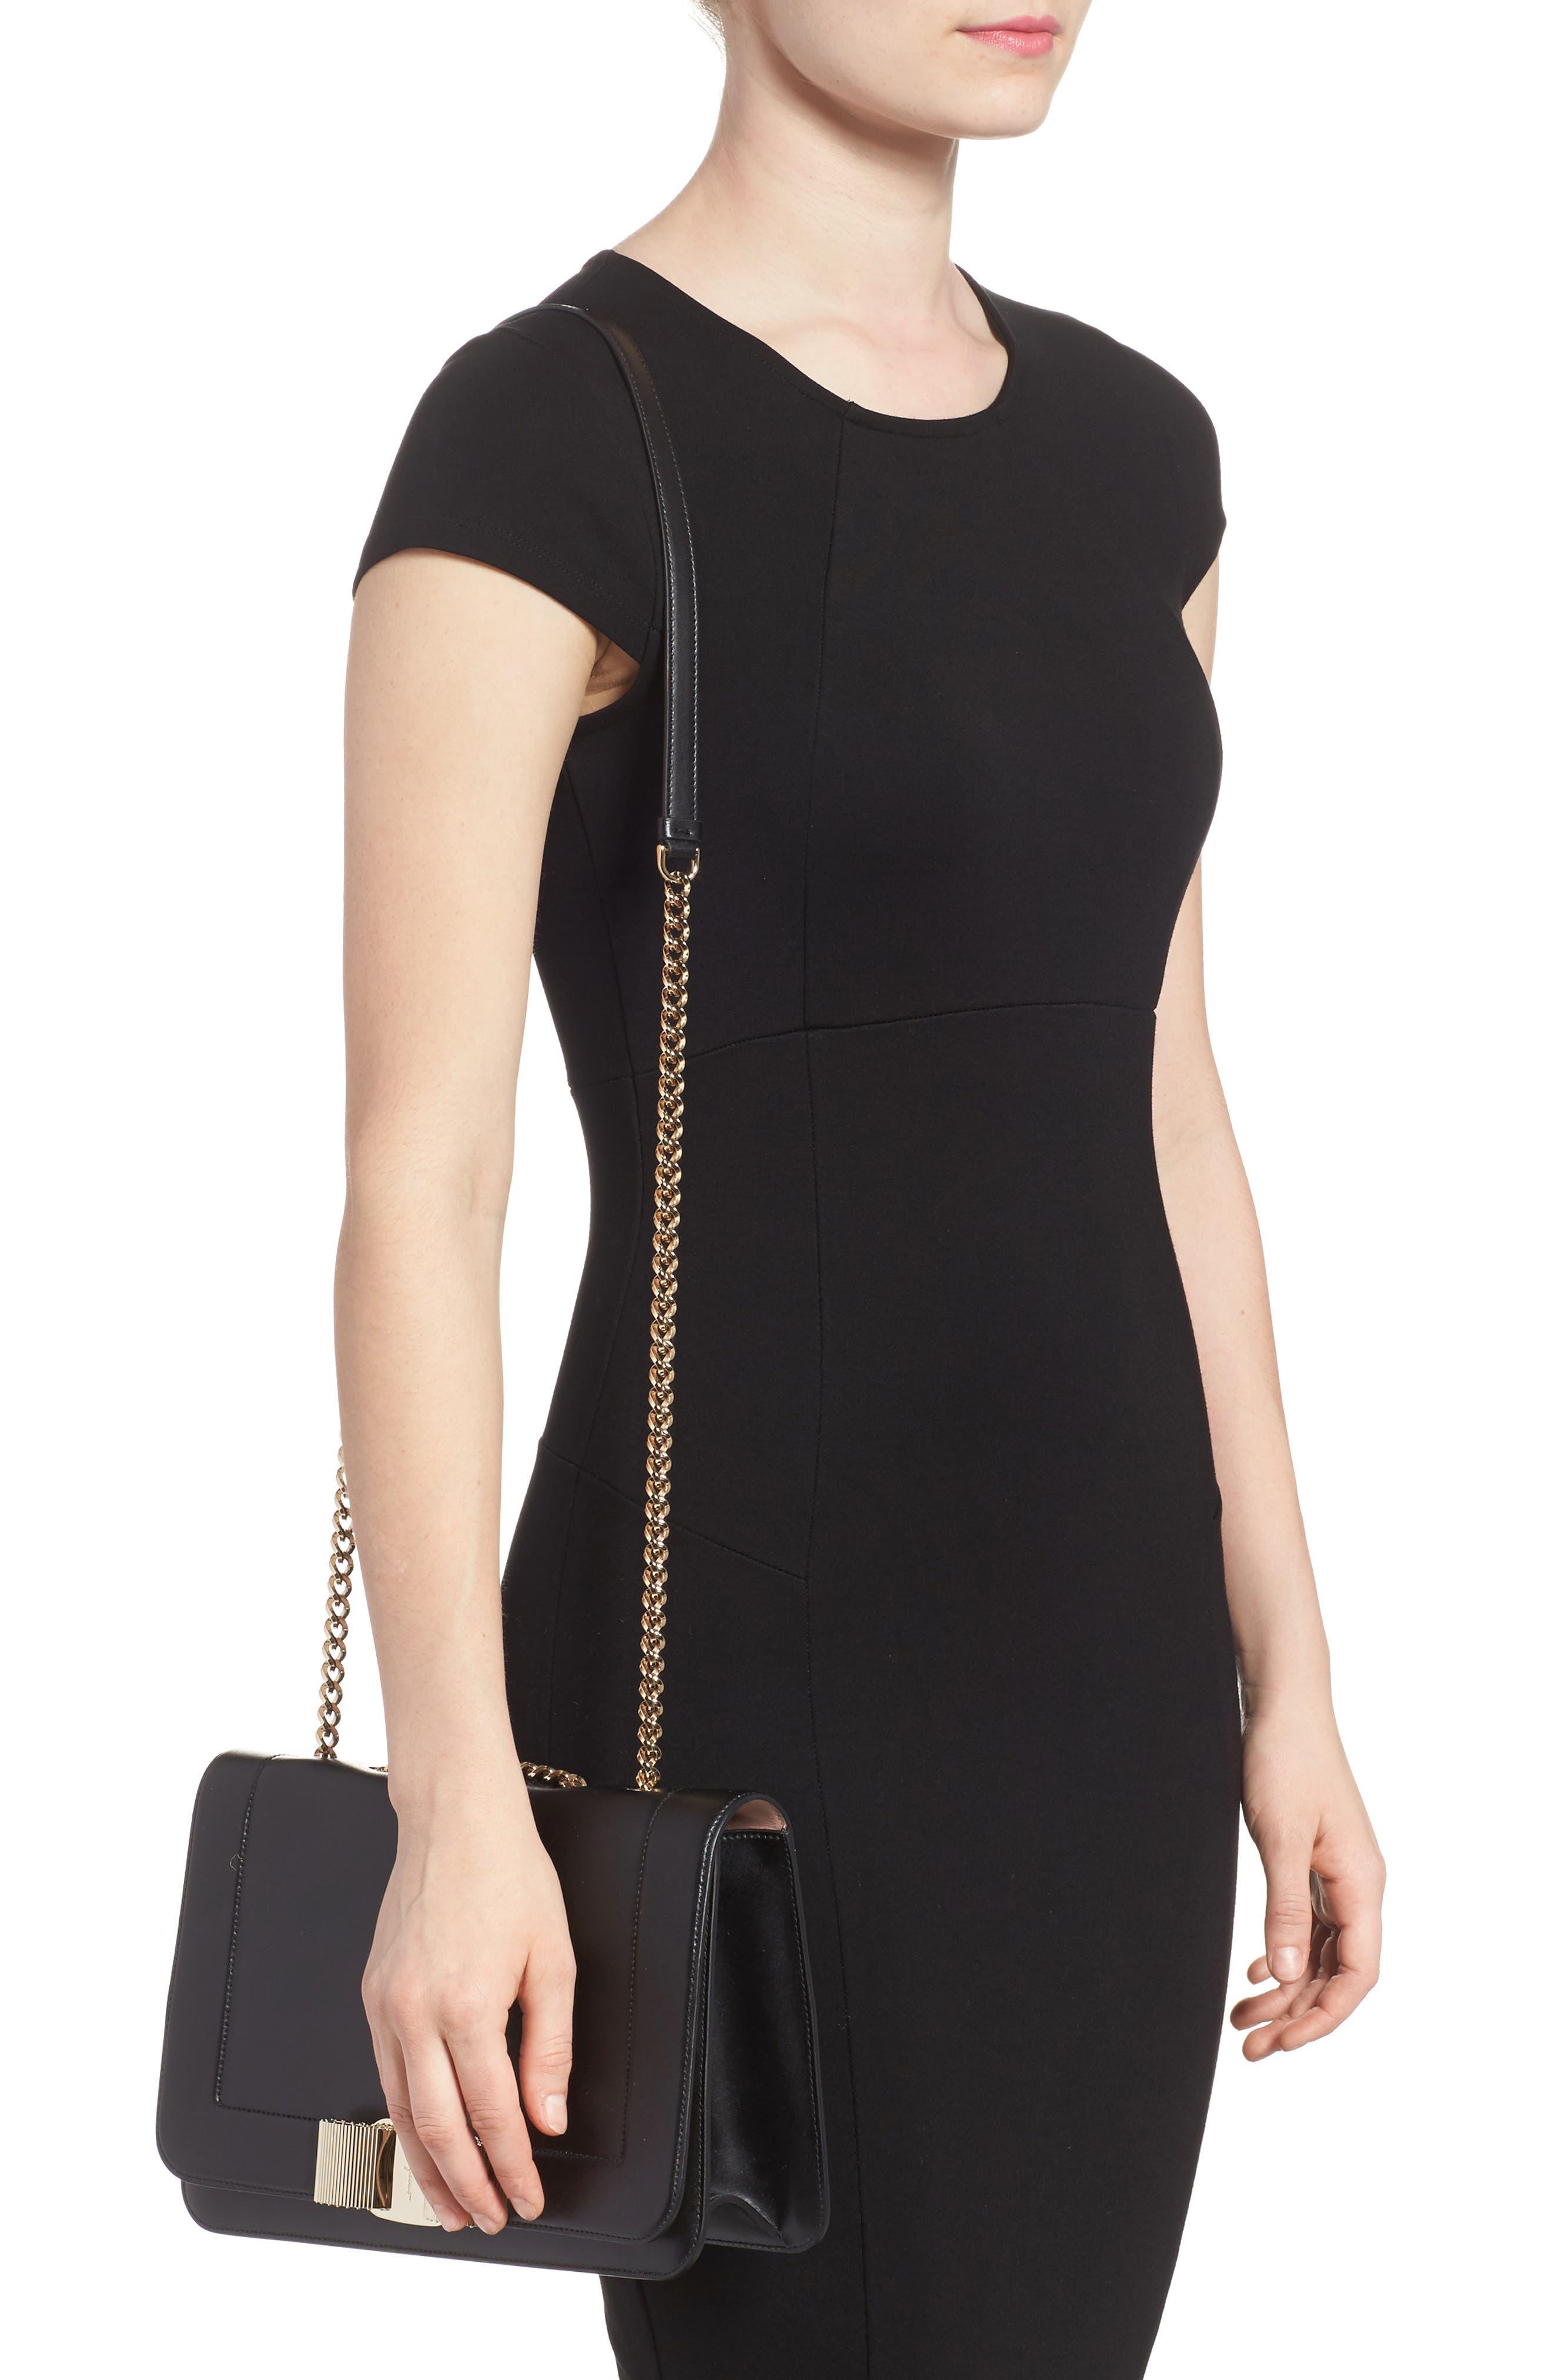 Vara Leather Shoulder Bag,                             Alternate thumbnail 2, color,                             Nero/ Bonbon